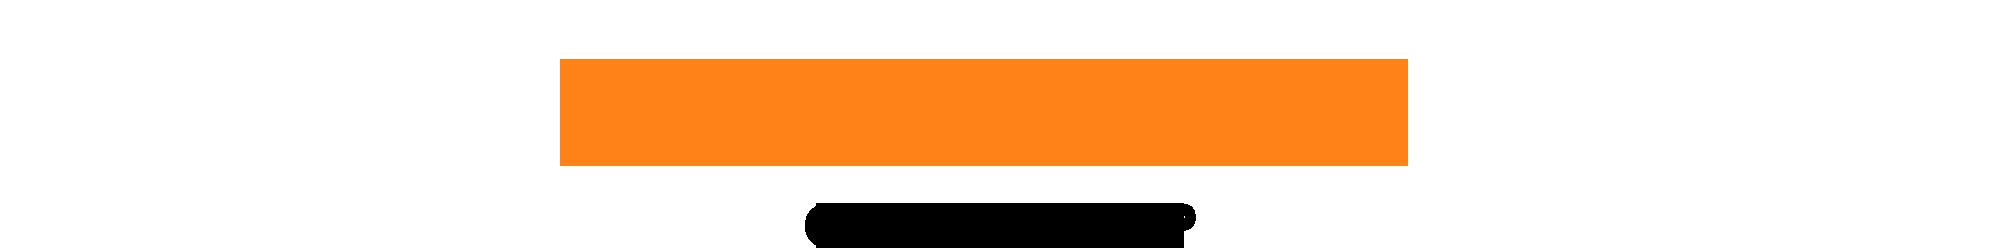 JellyWare Online shop